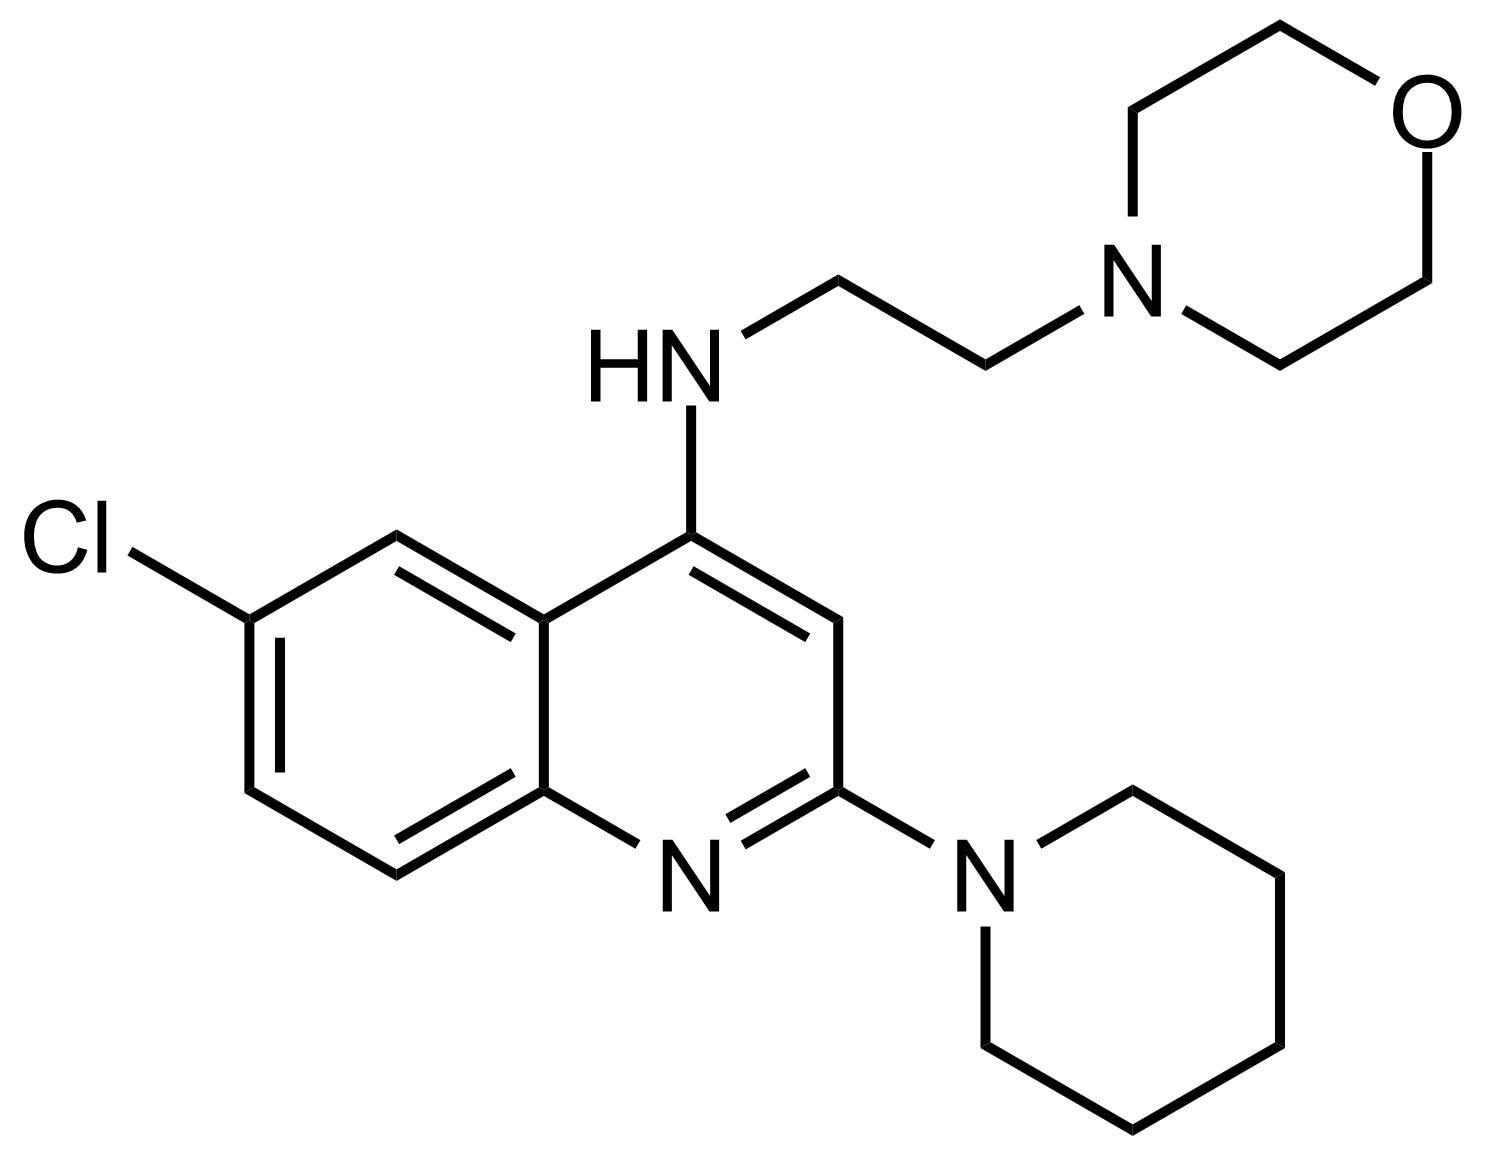 Structure of 6-Chloro-N-(2-morpholinoethyl)-2-(piperidin-1-yl)quinolin-4-amine